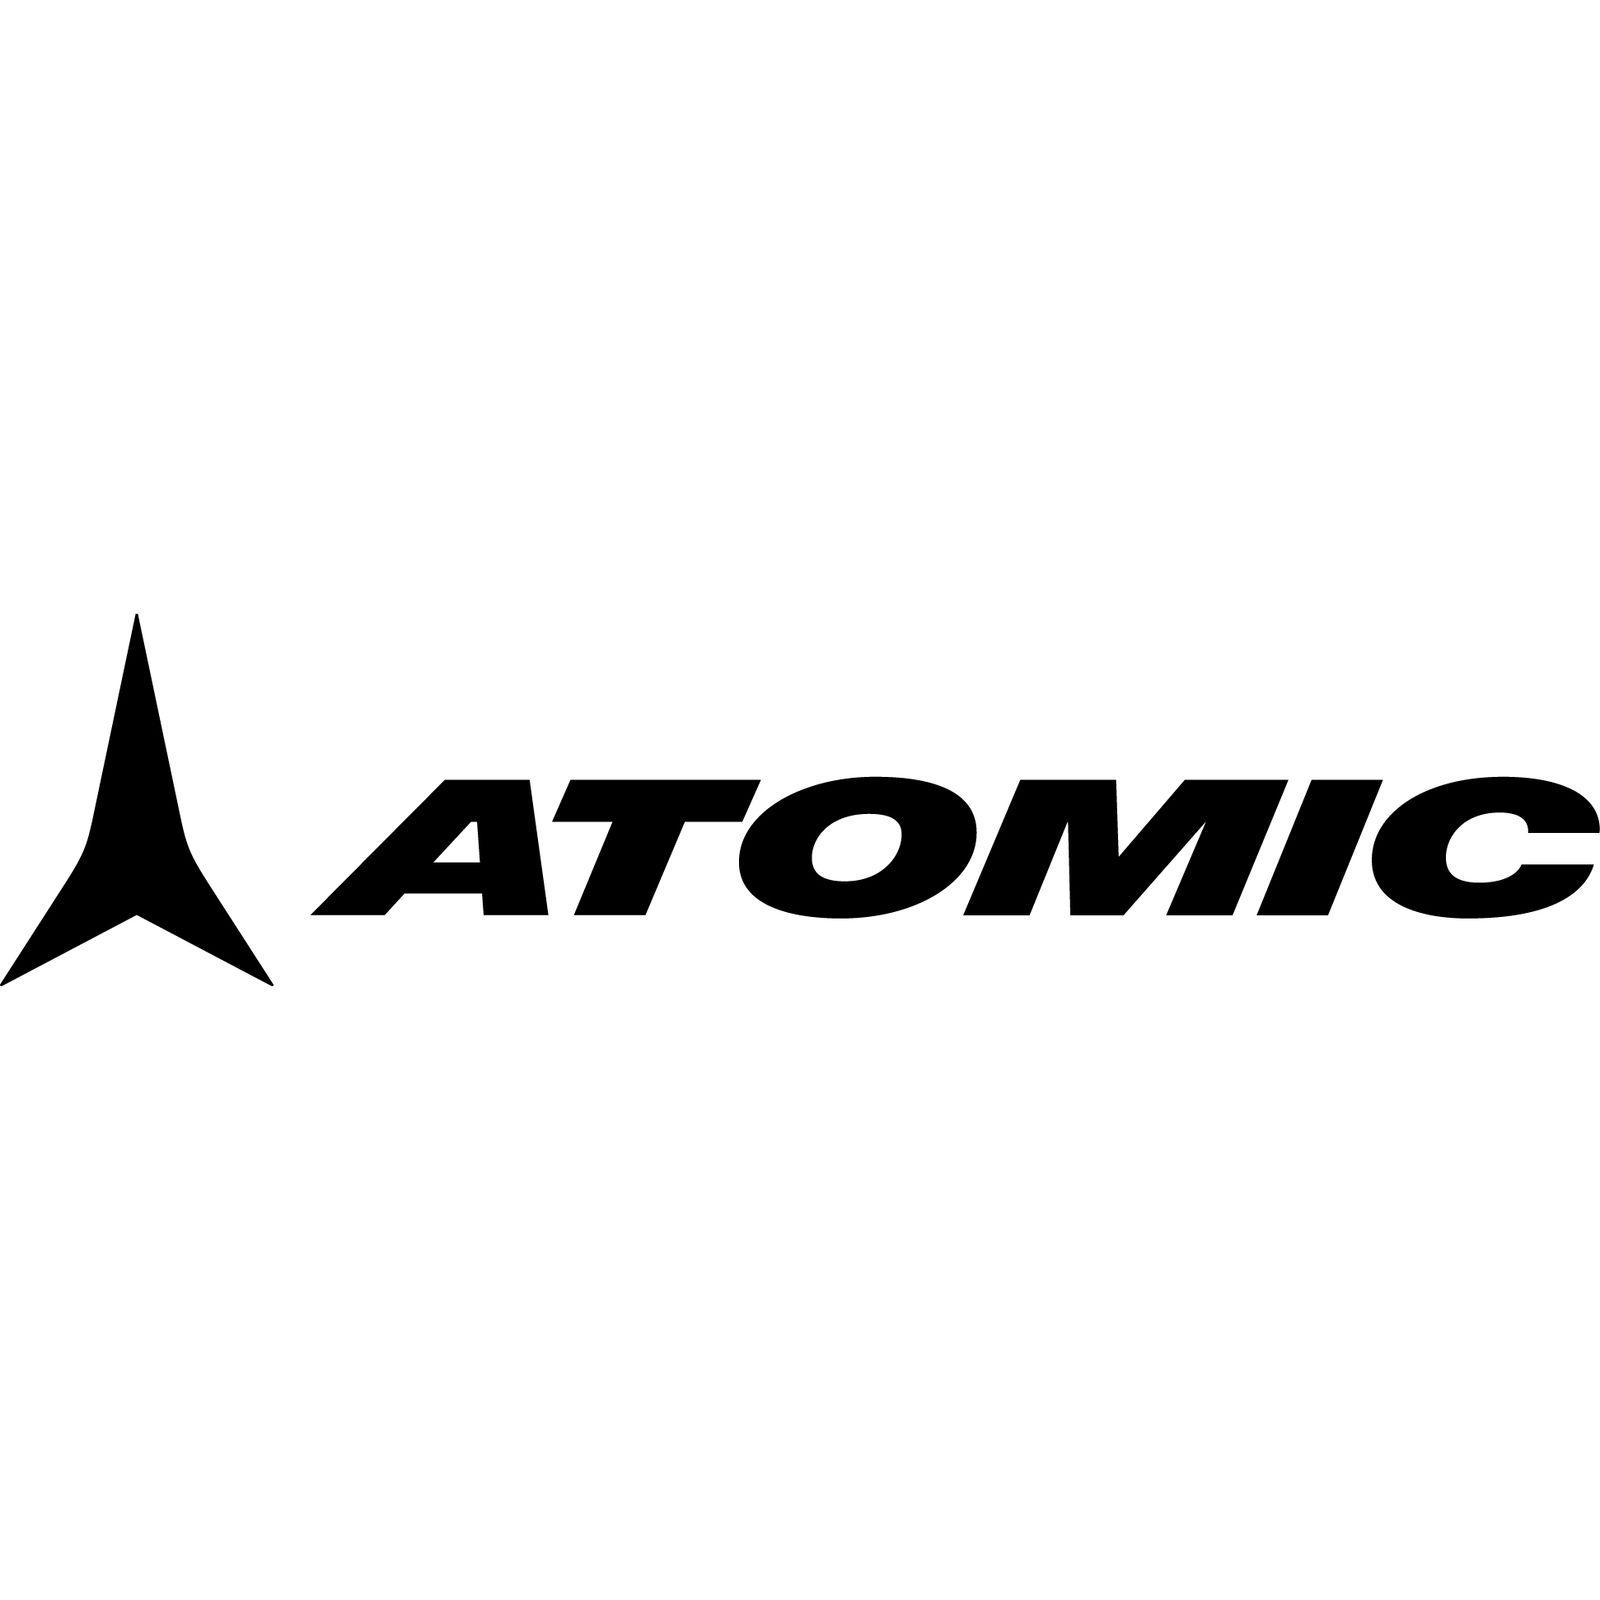 ATOMIC (Bild 1)